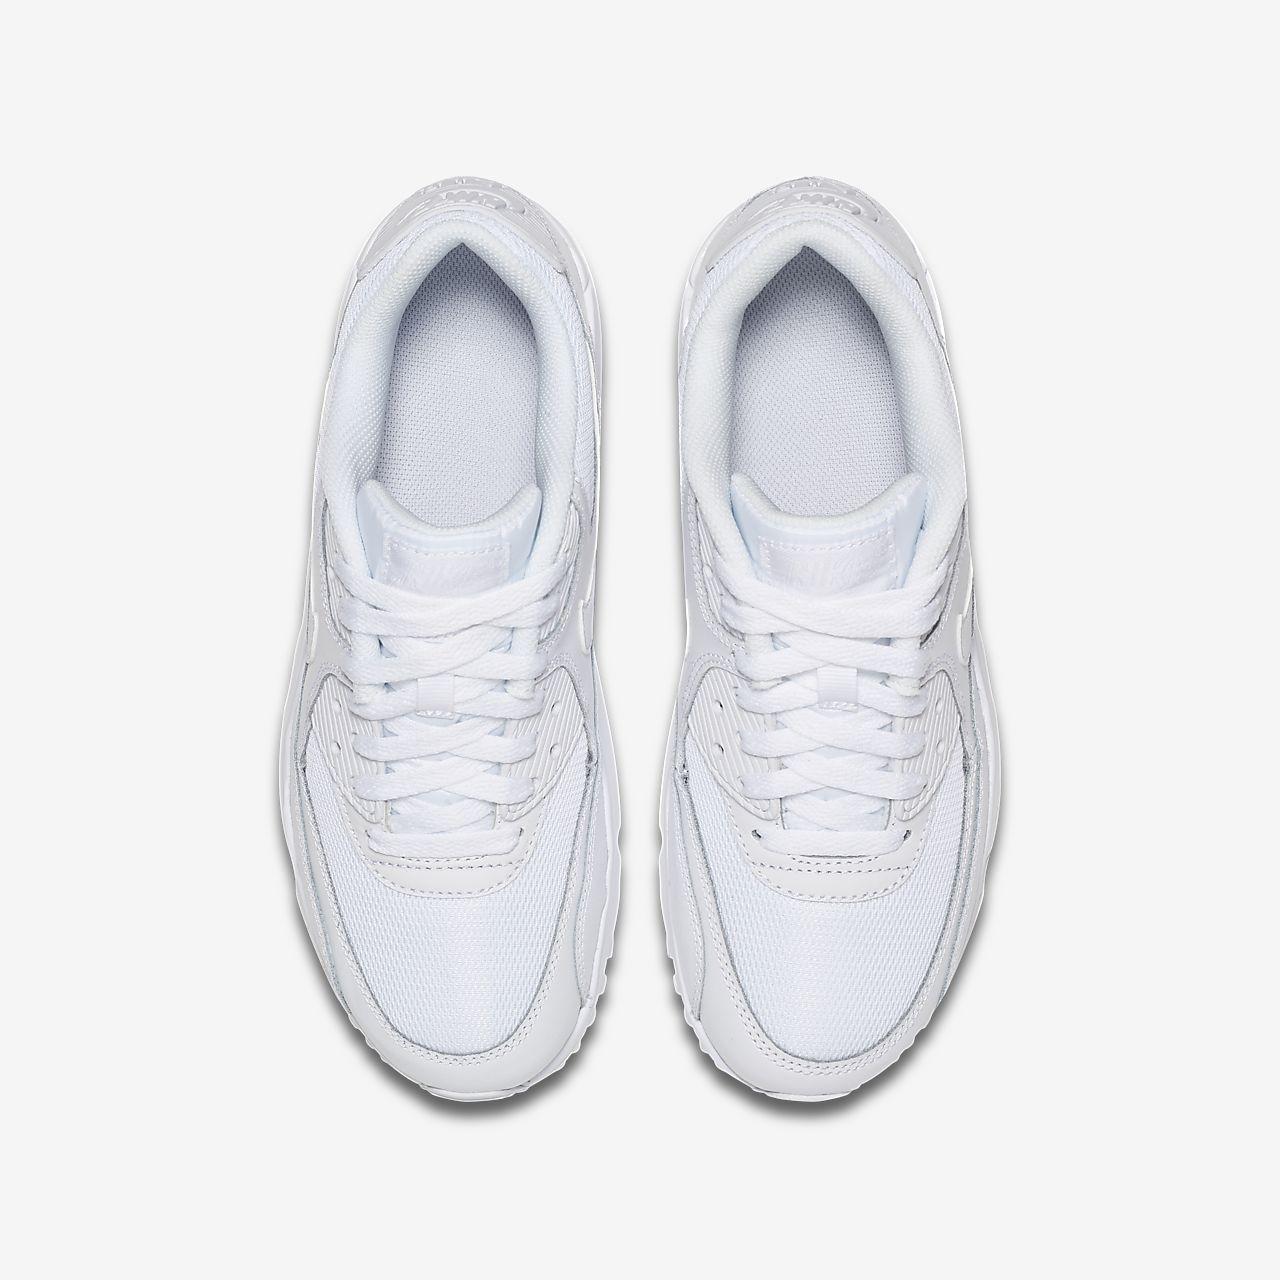 check out 8e727 2a667 ... Nike Air Max 90 Mesh Older Kids  Shoe